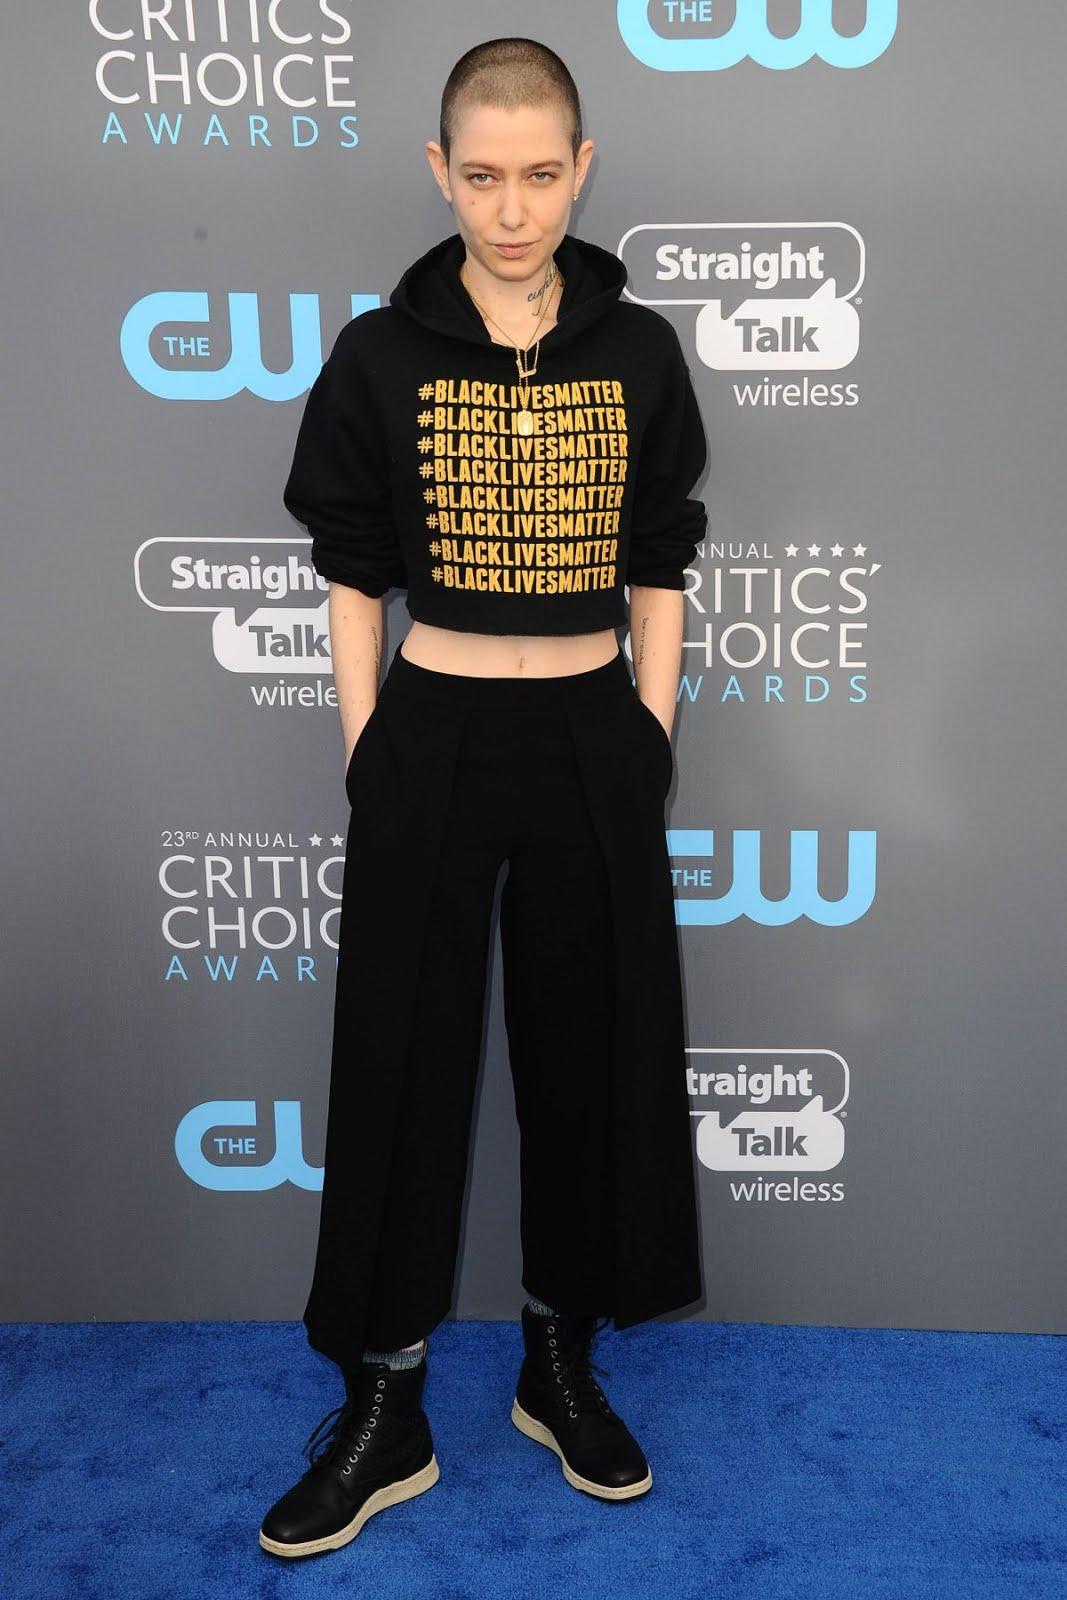 HD Photos of Asia Kate Dillon At 2018 critics Choice Awards In Santa Monica